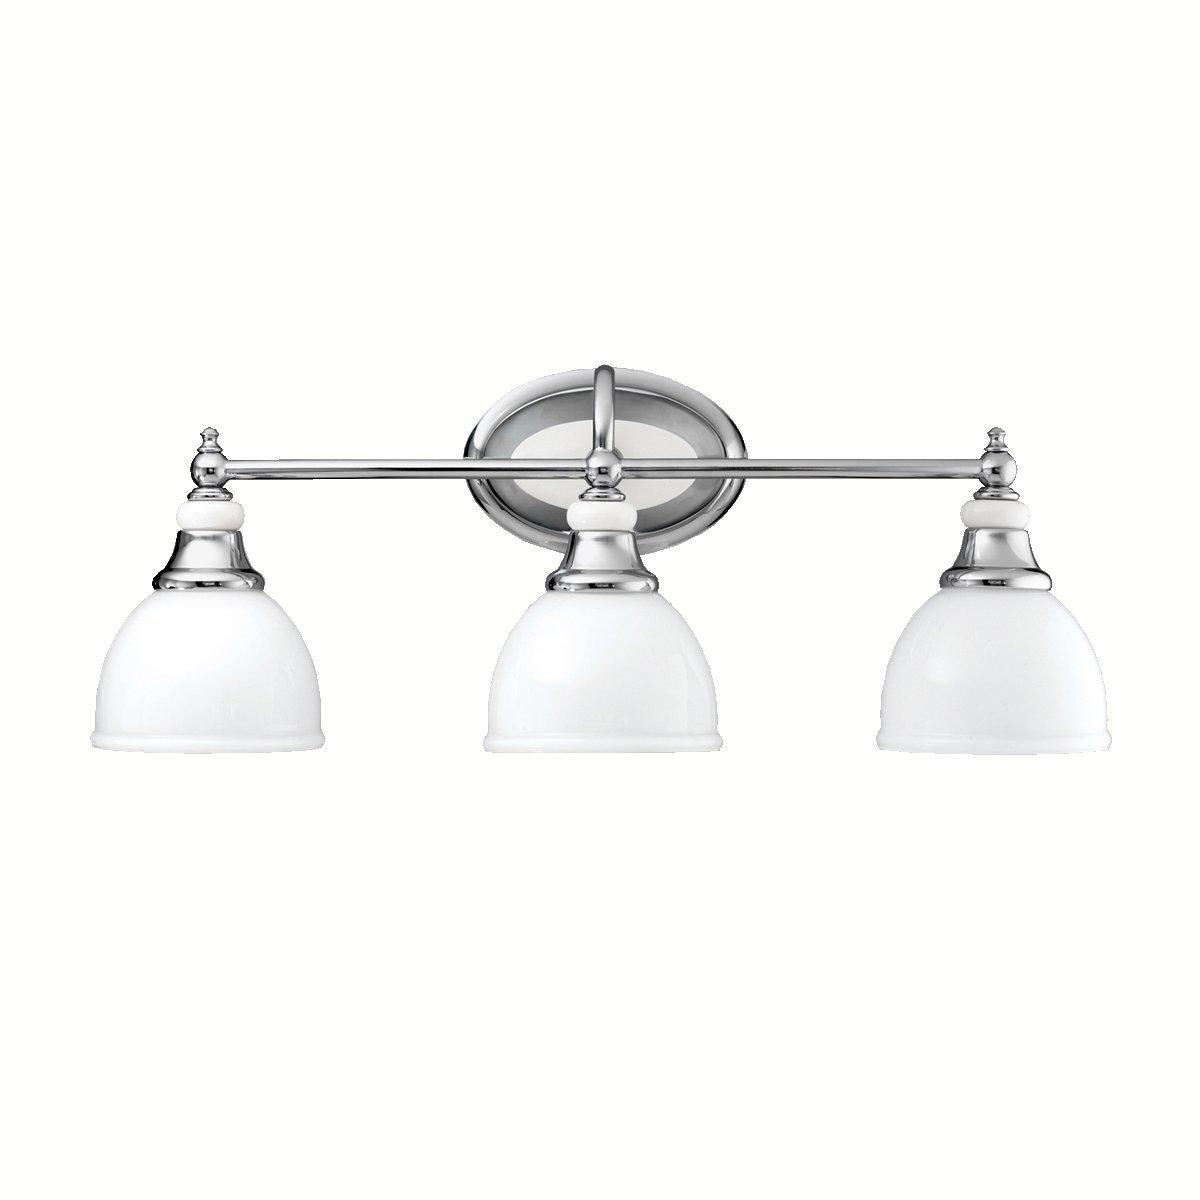 Kichler 5369CH Pocelona Bath 3-Light, Chrome - Vanity Lighting ...